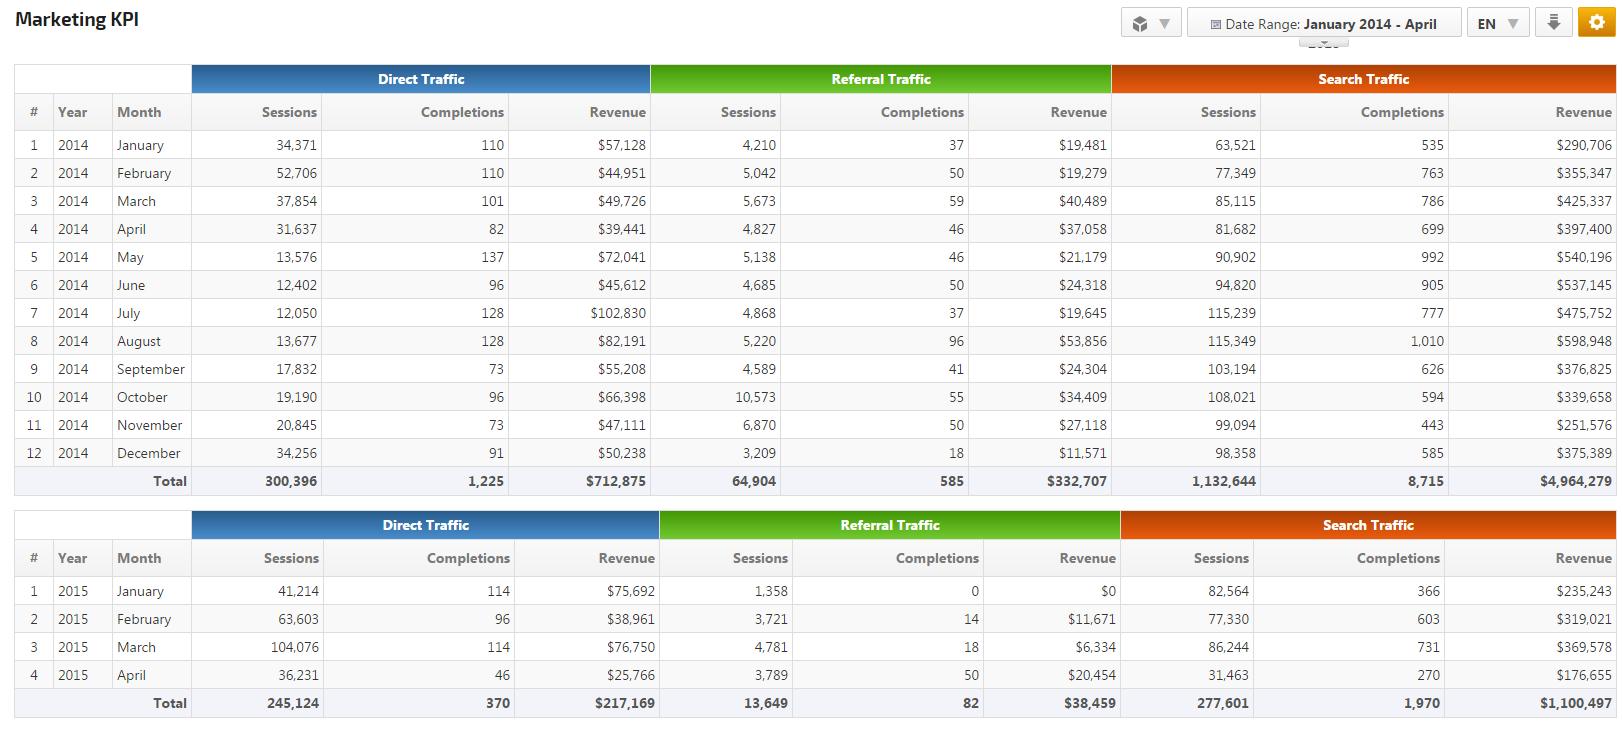 Rank Ranger's Marketing KPI